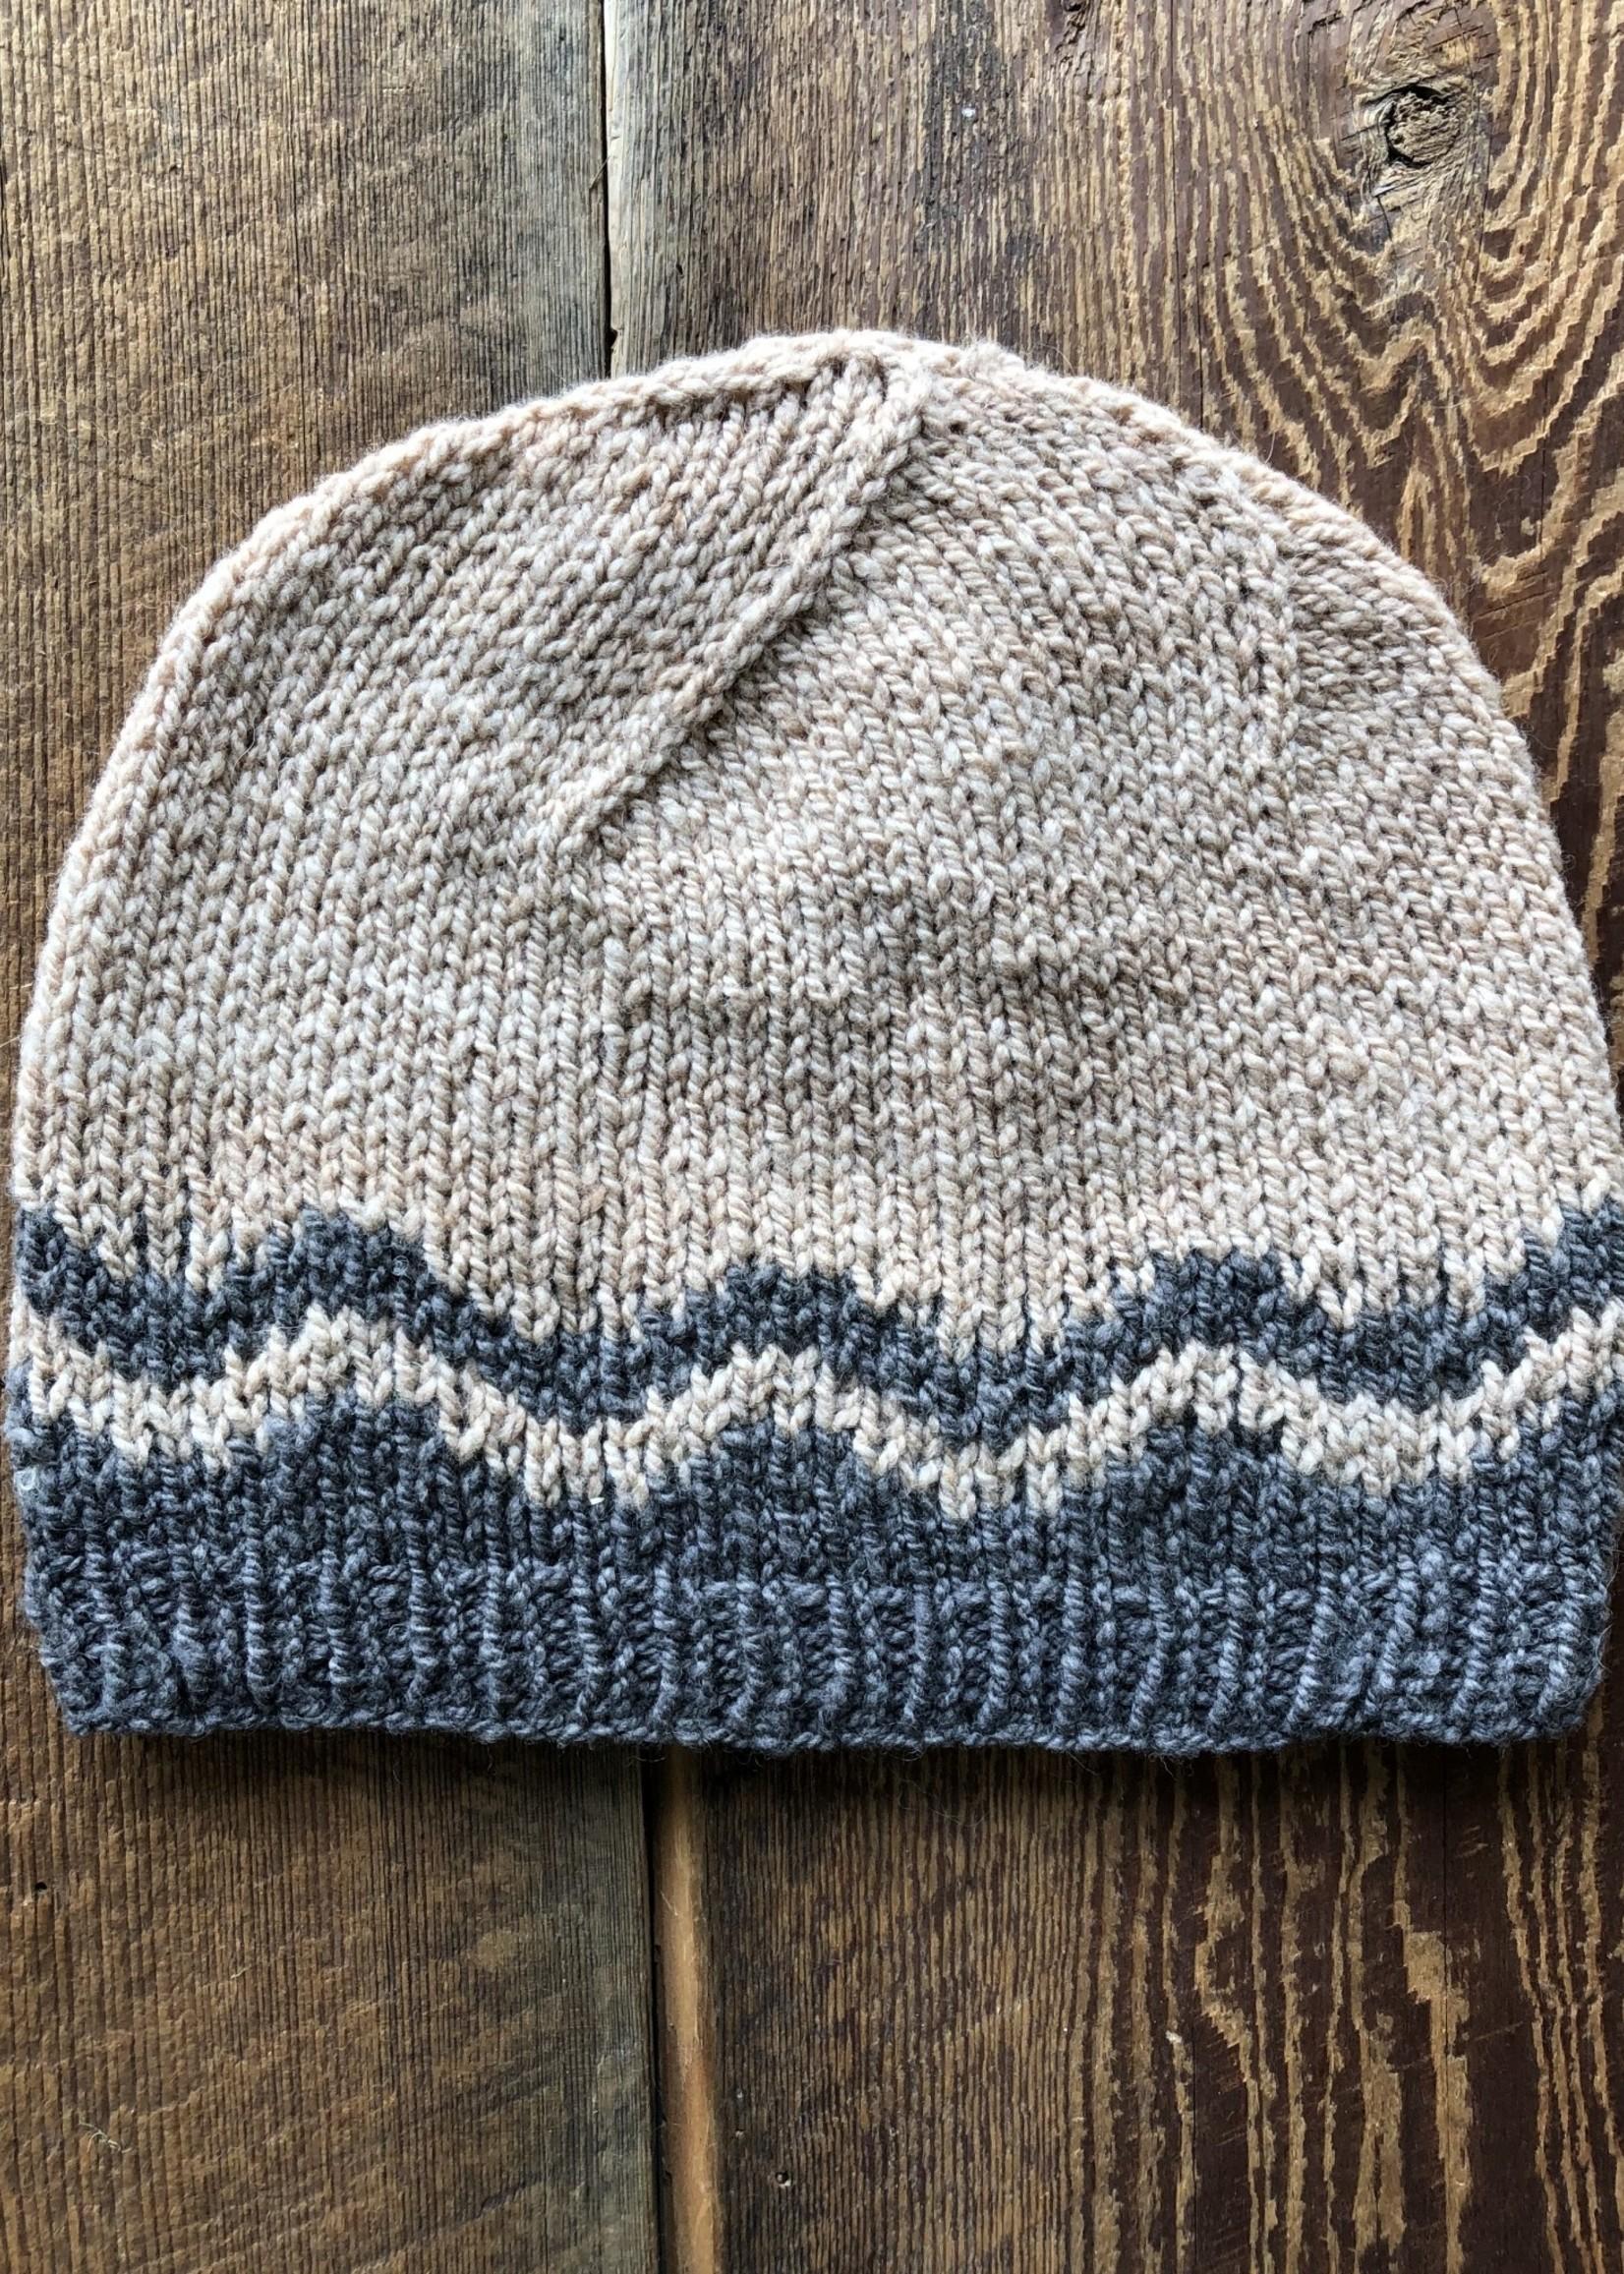 Mollie Mae Hat (Handspun Hope)